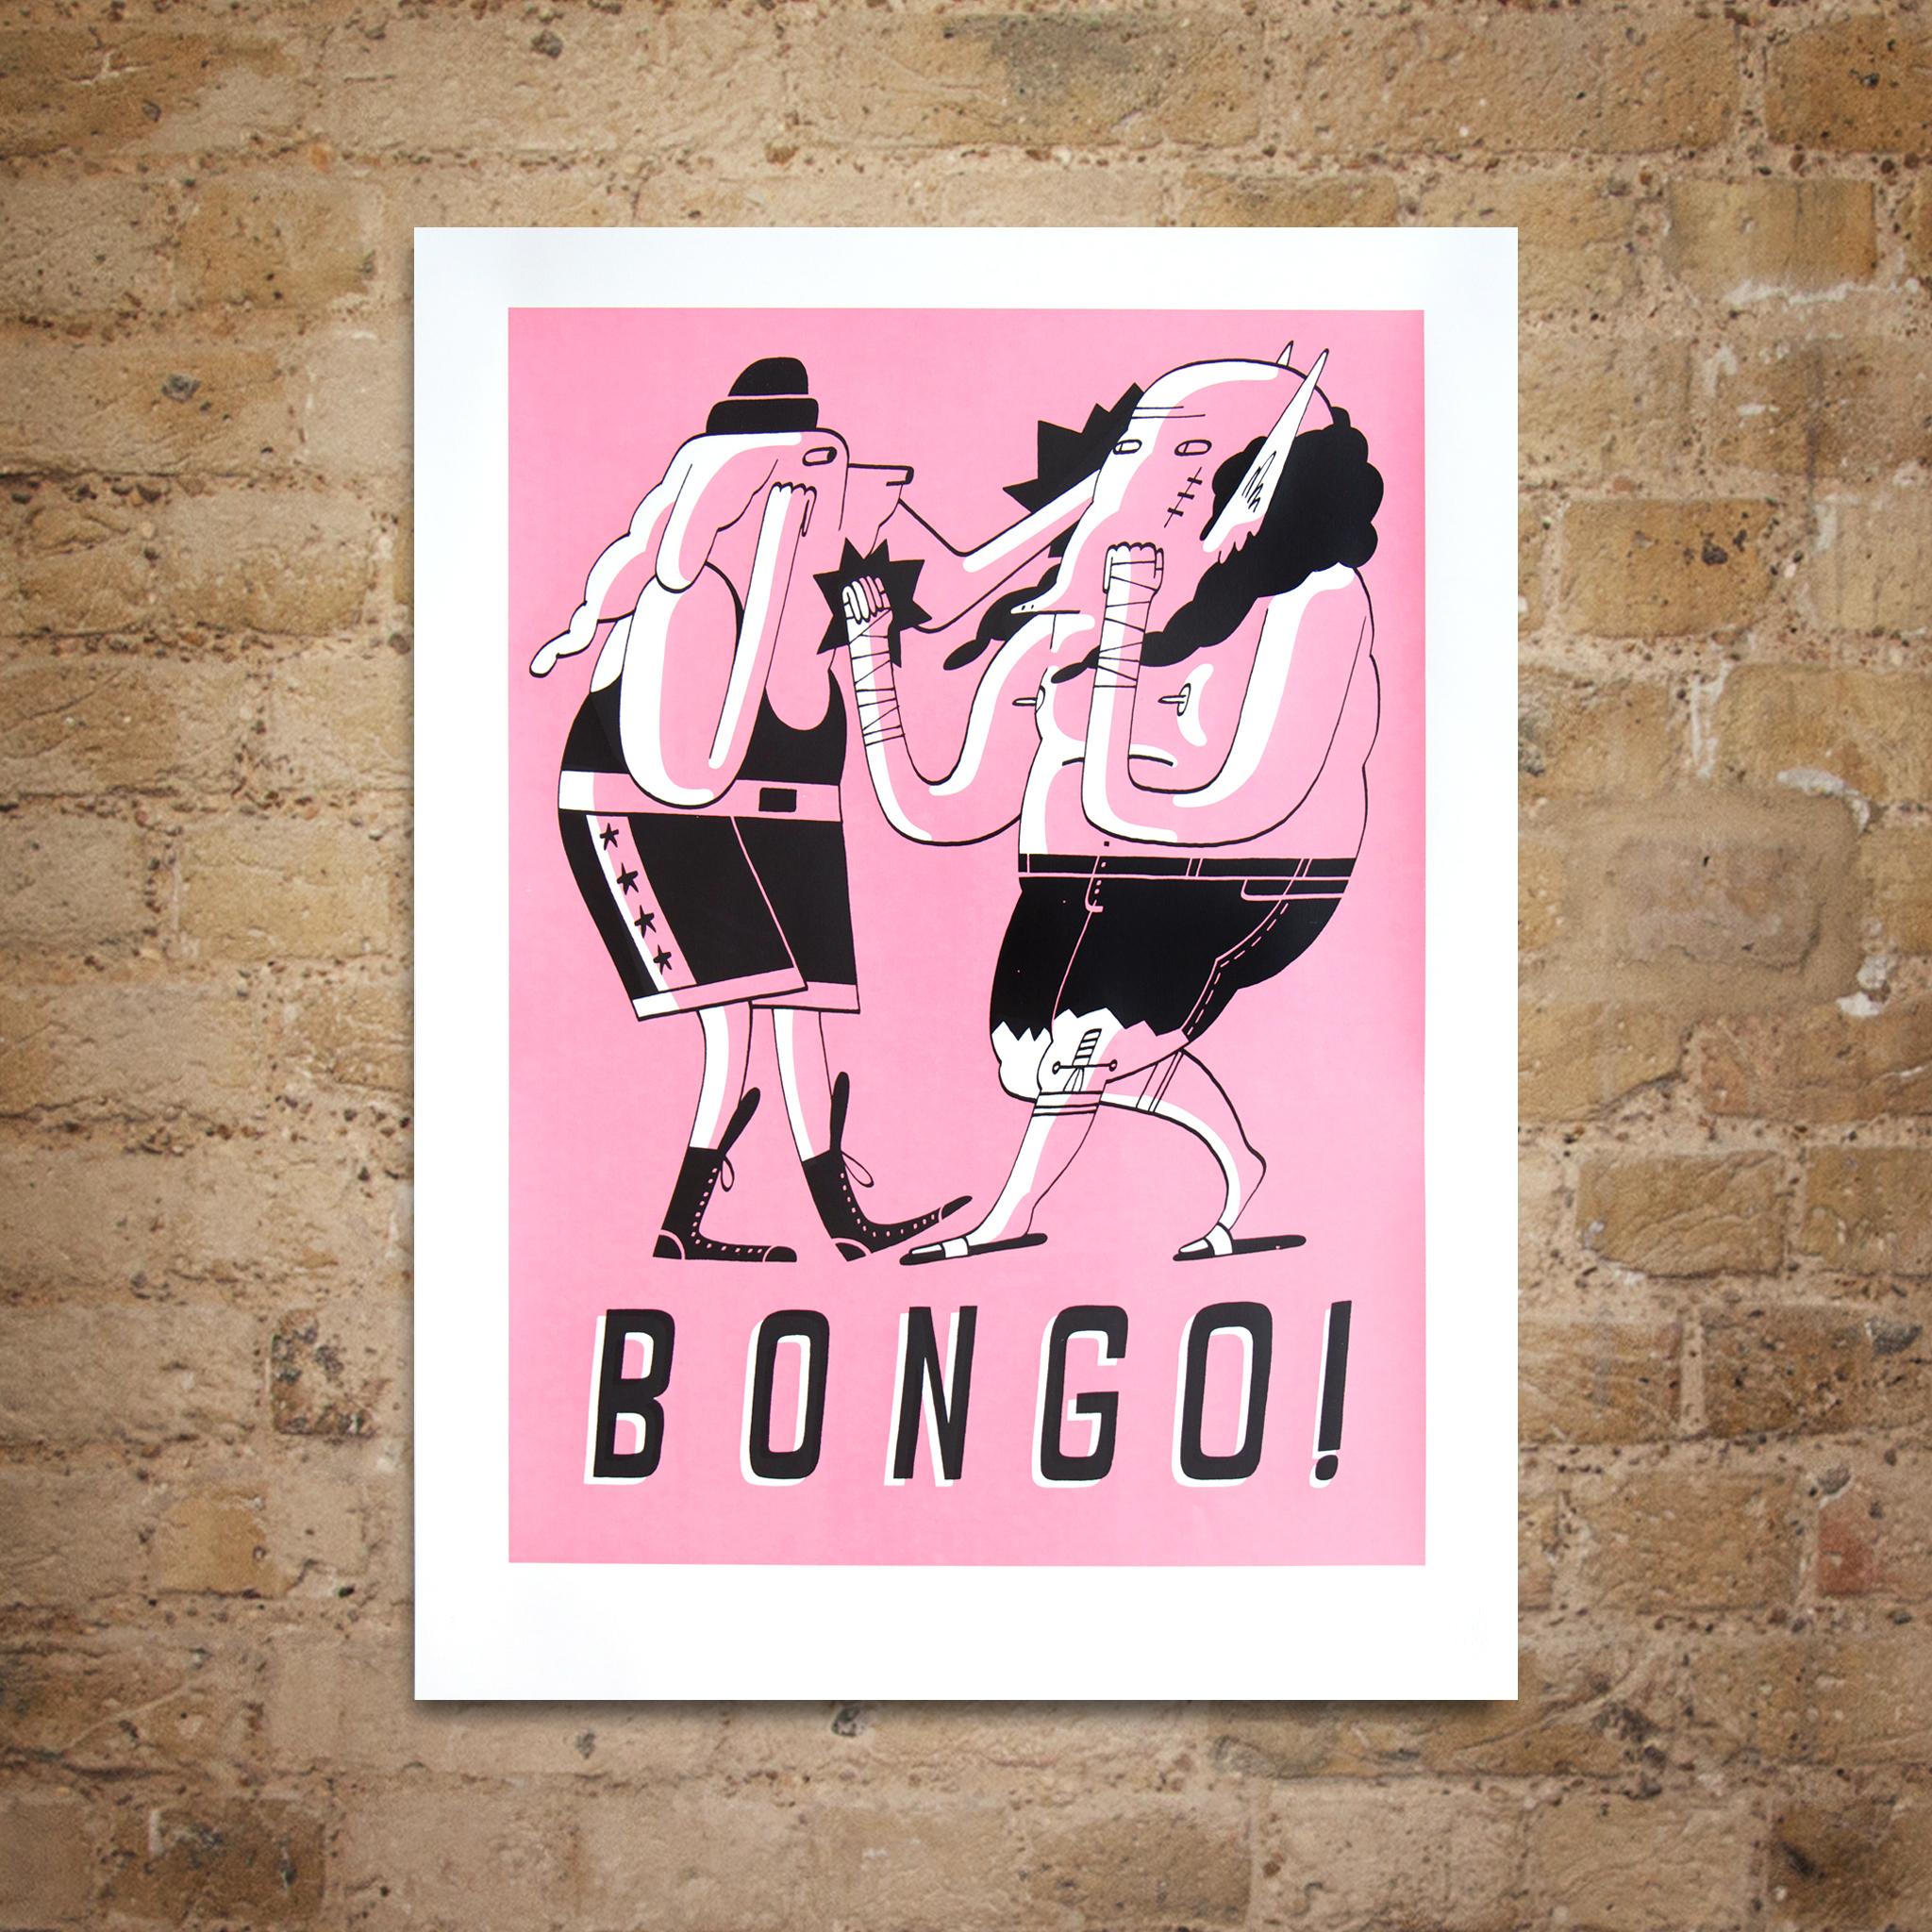 Bongo! print by Matt the Horse